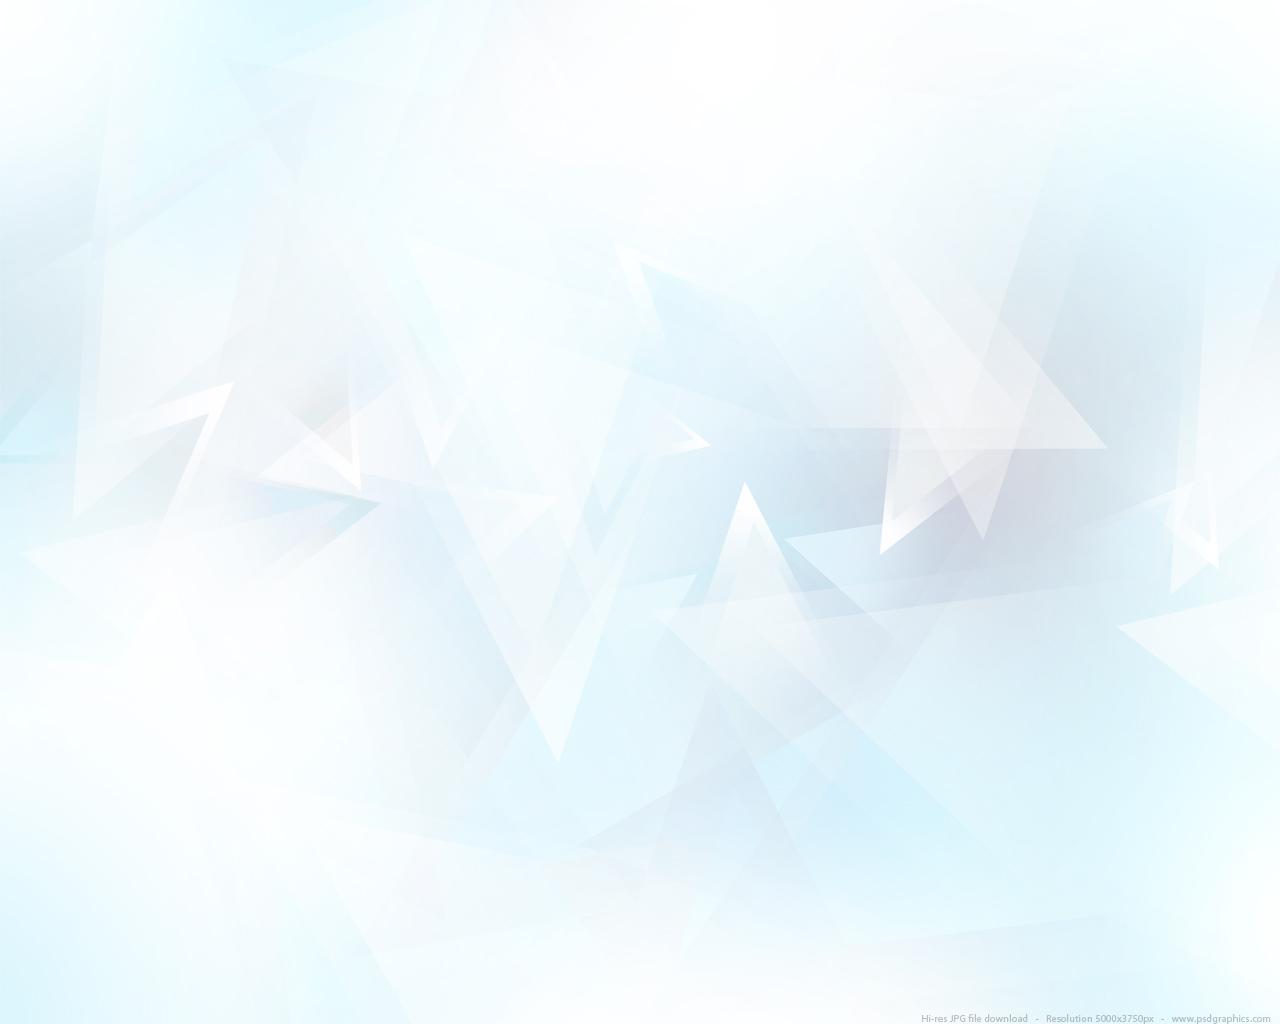 Cool white background - Cool White Background 33